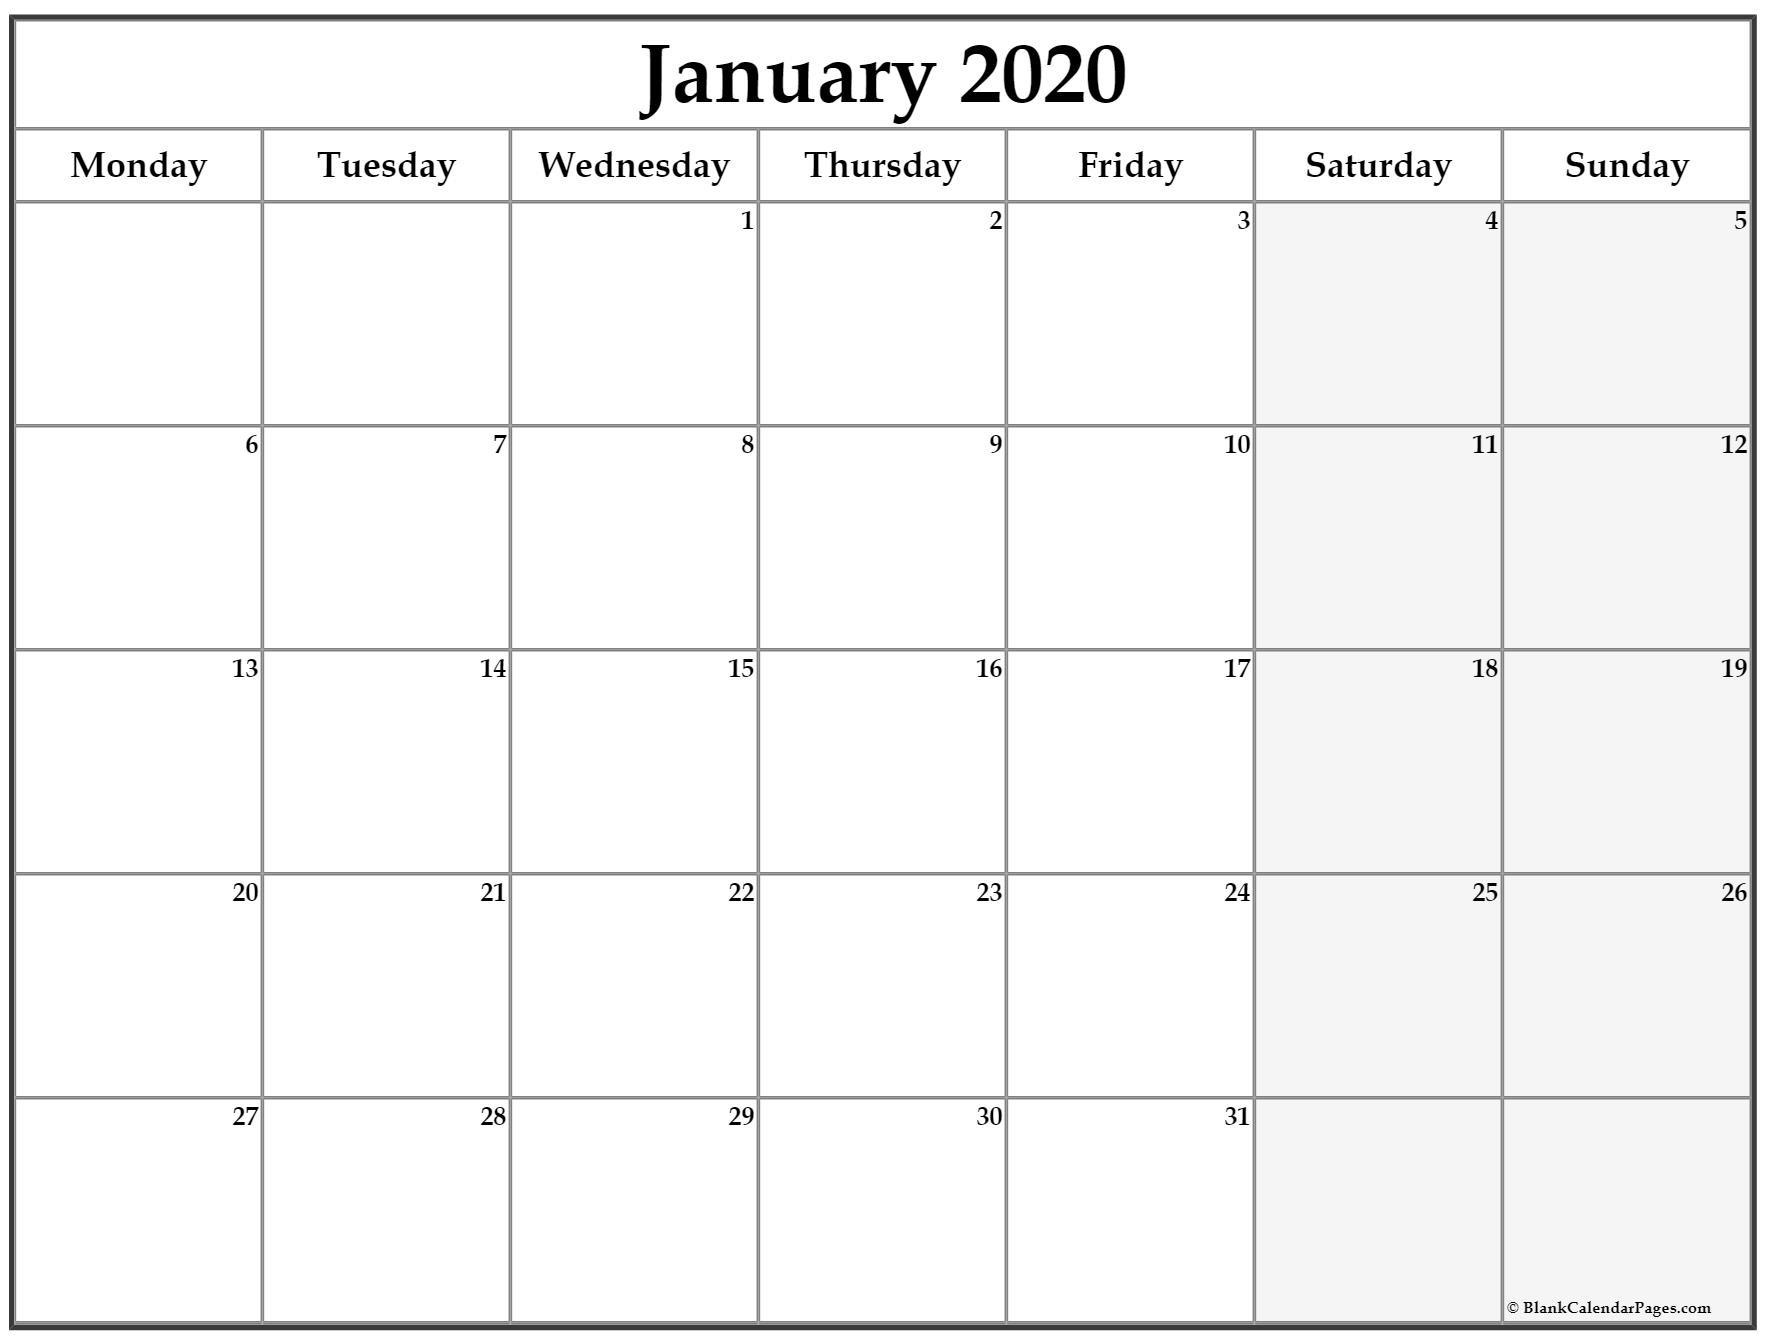 January 2020 Monday Calendar | Monday To Sunday-Monday Friday Blank Calendar